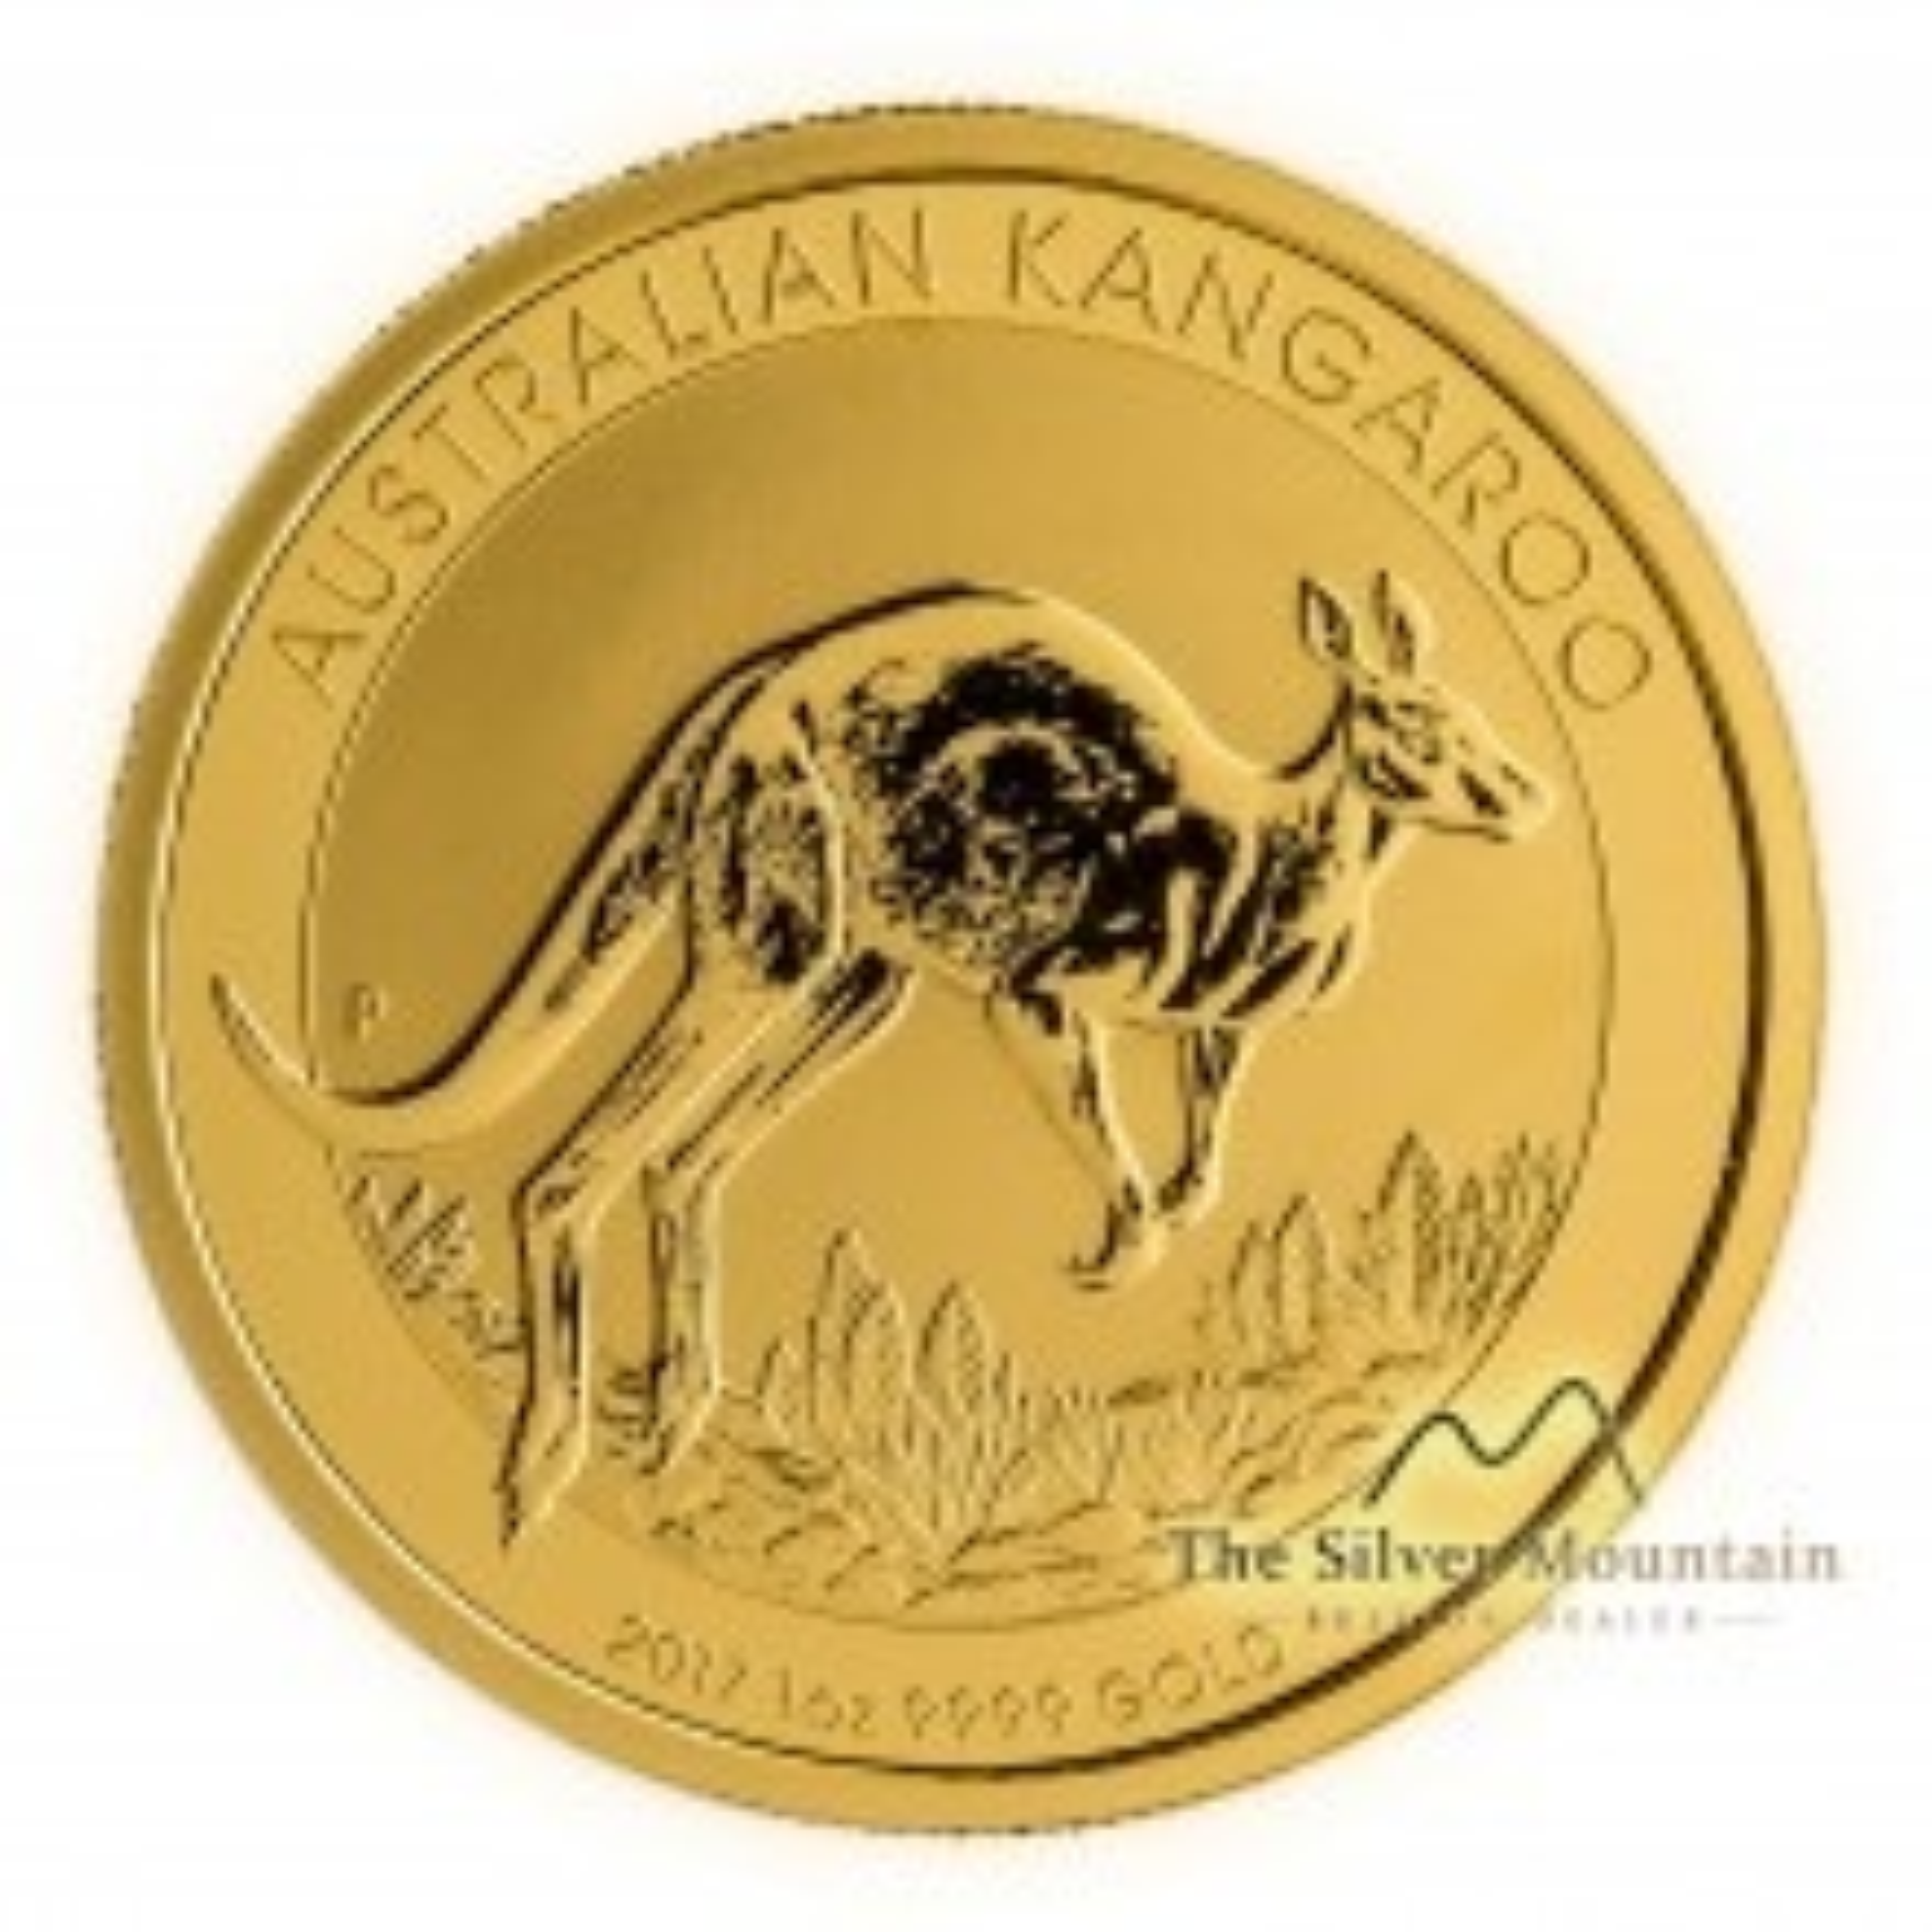 1 troy ounce gold Kangaroo